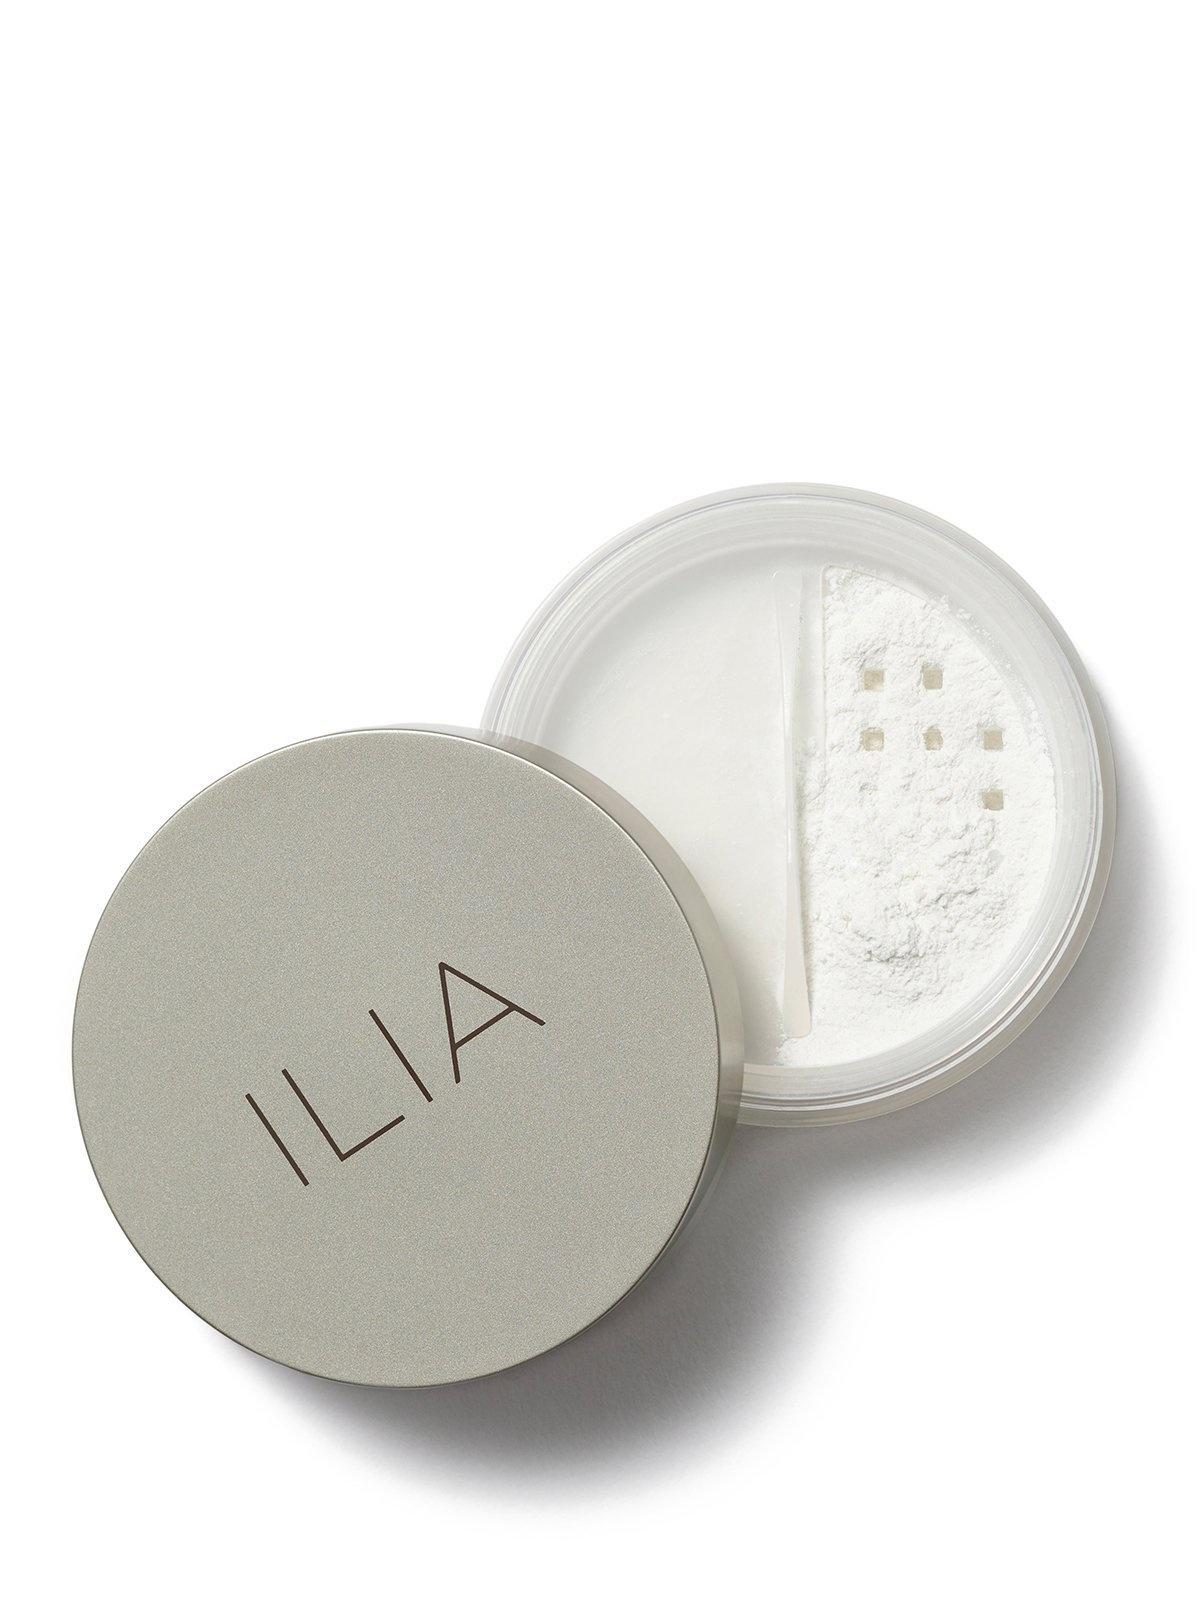 ILIA Beauty Soft Focus Finishing Powder FADE INTO YOU